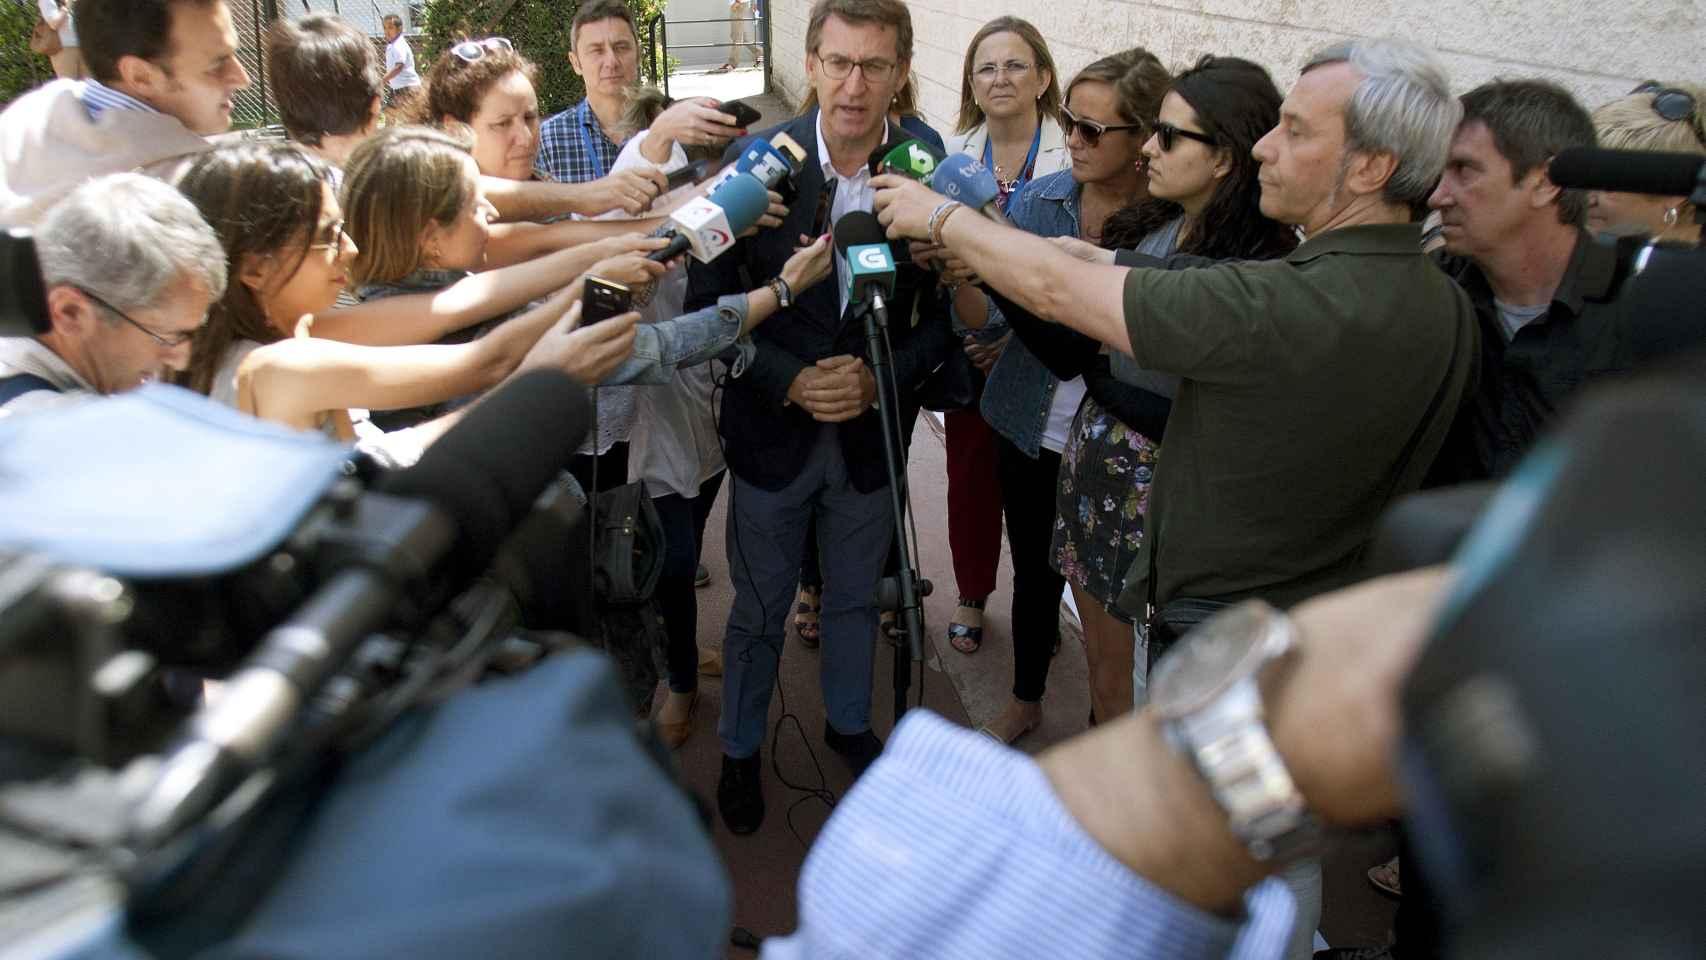 Feijoo atiende a los medios en un momentod e la legislatura